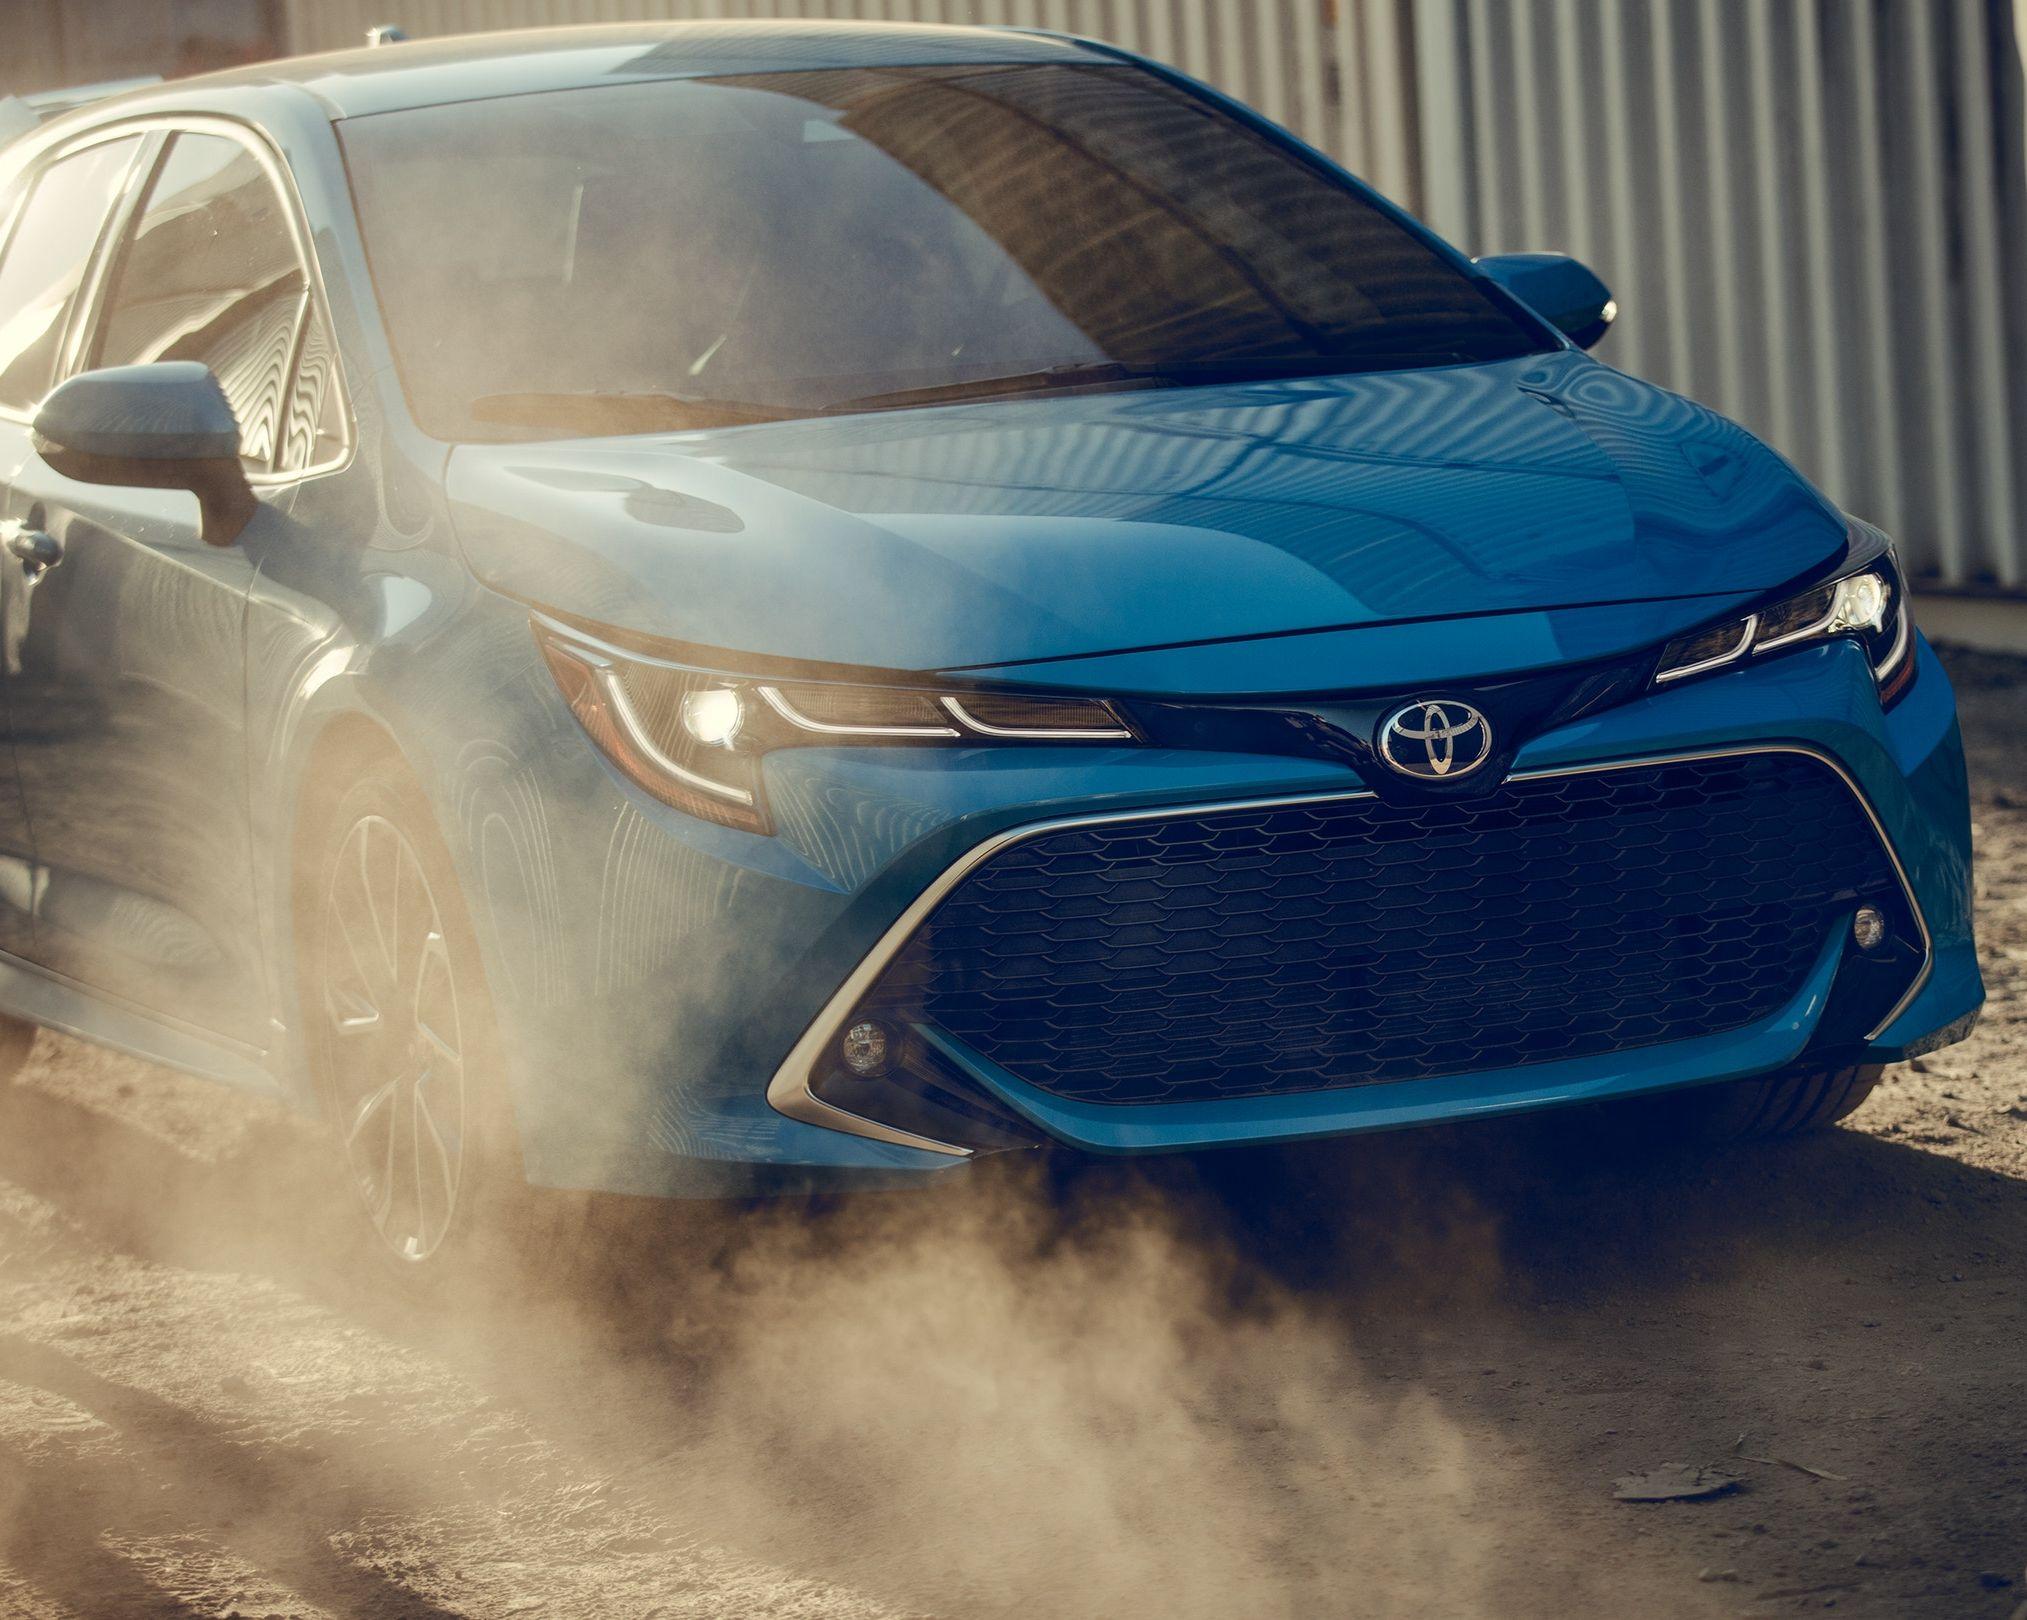 2019 Toyota Corolla Hatchback for Sale near Belton, MO, 64012